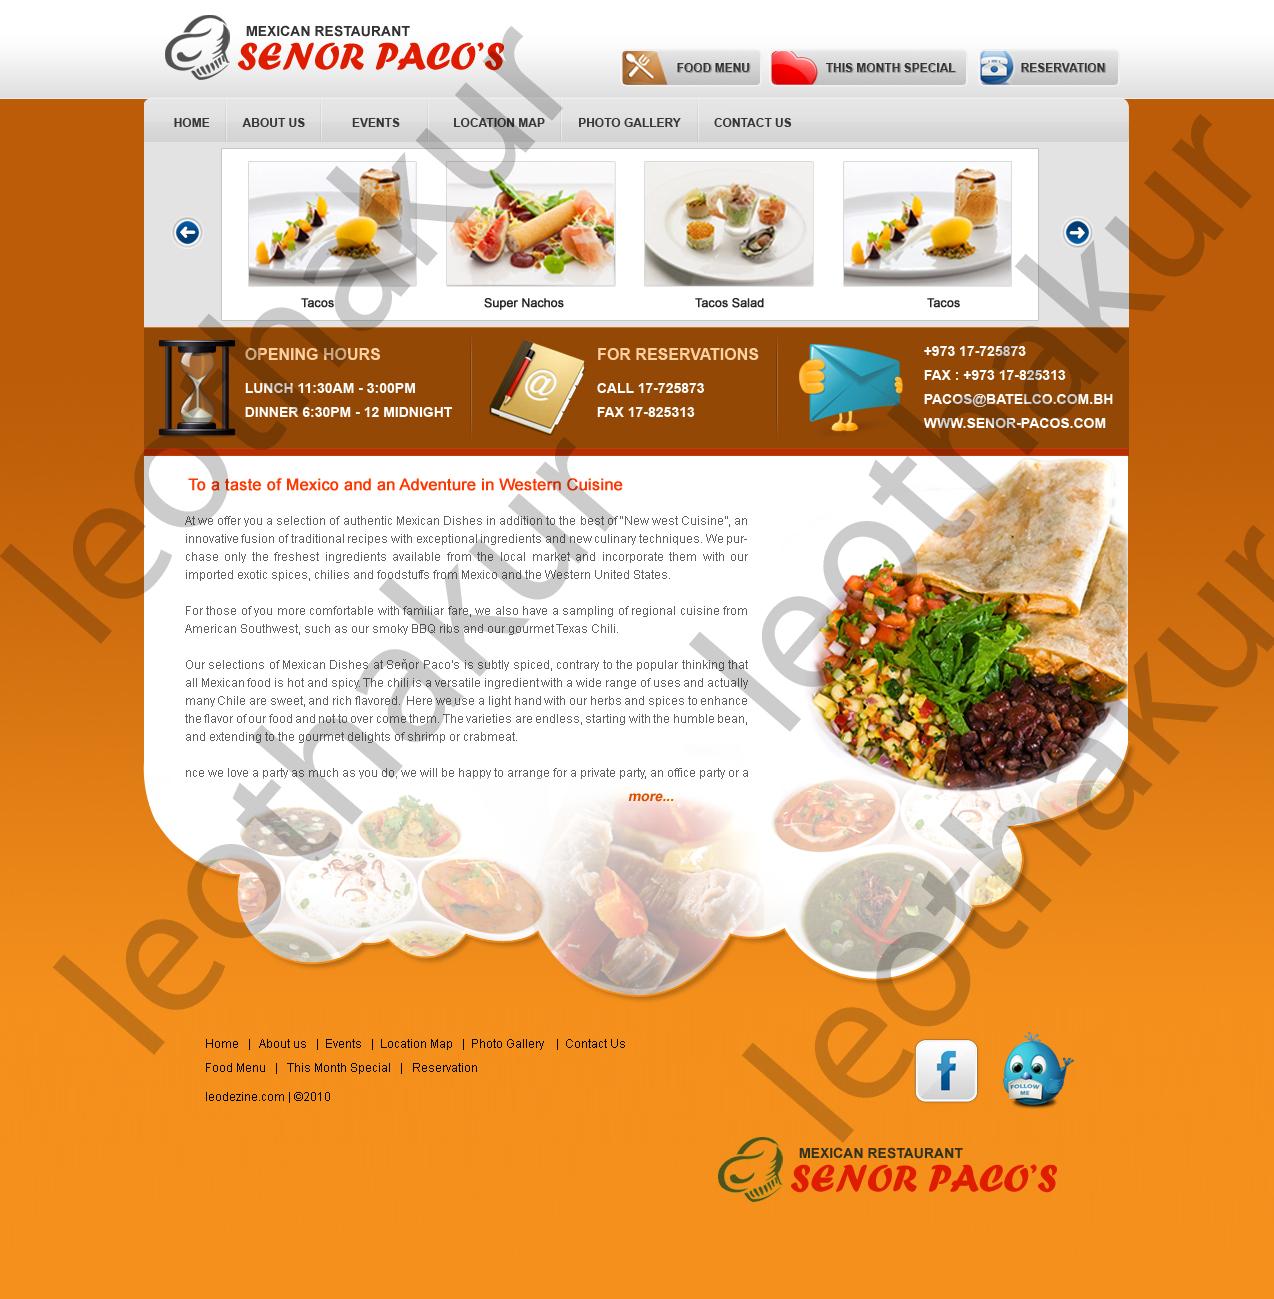 Incredible restaurant layout design by leothakur designs interfaces web  1274 x 1299 · 849 kB · jpeg